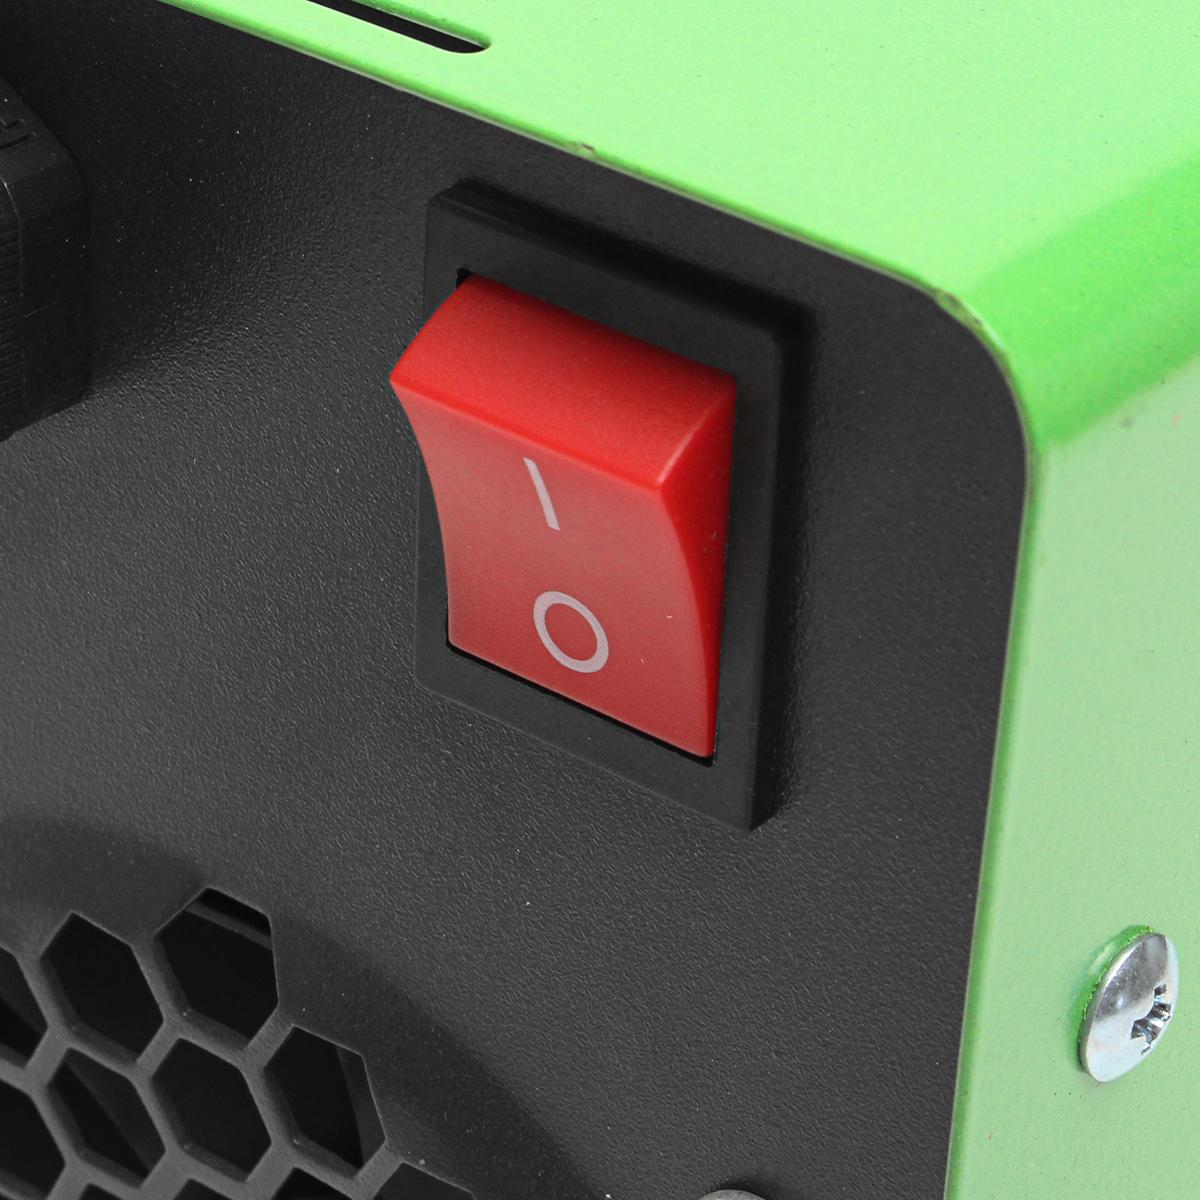 220V 40W MMA-200 Handheld Mini Electric Welding Machine Welding Inverter ARC MMA